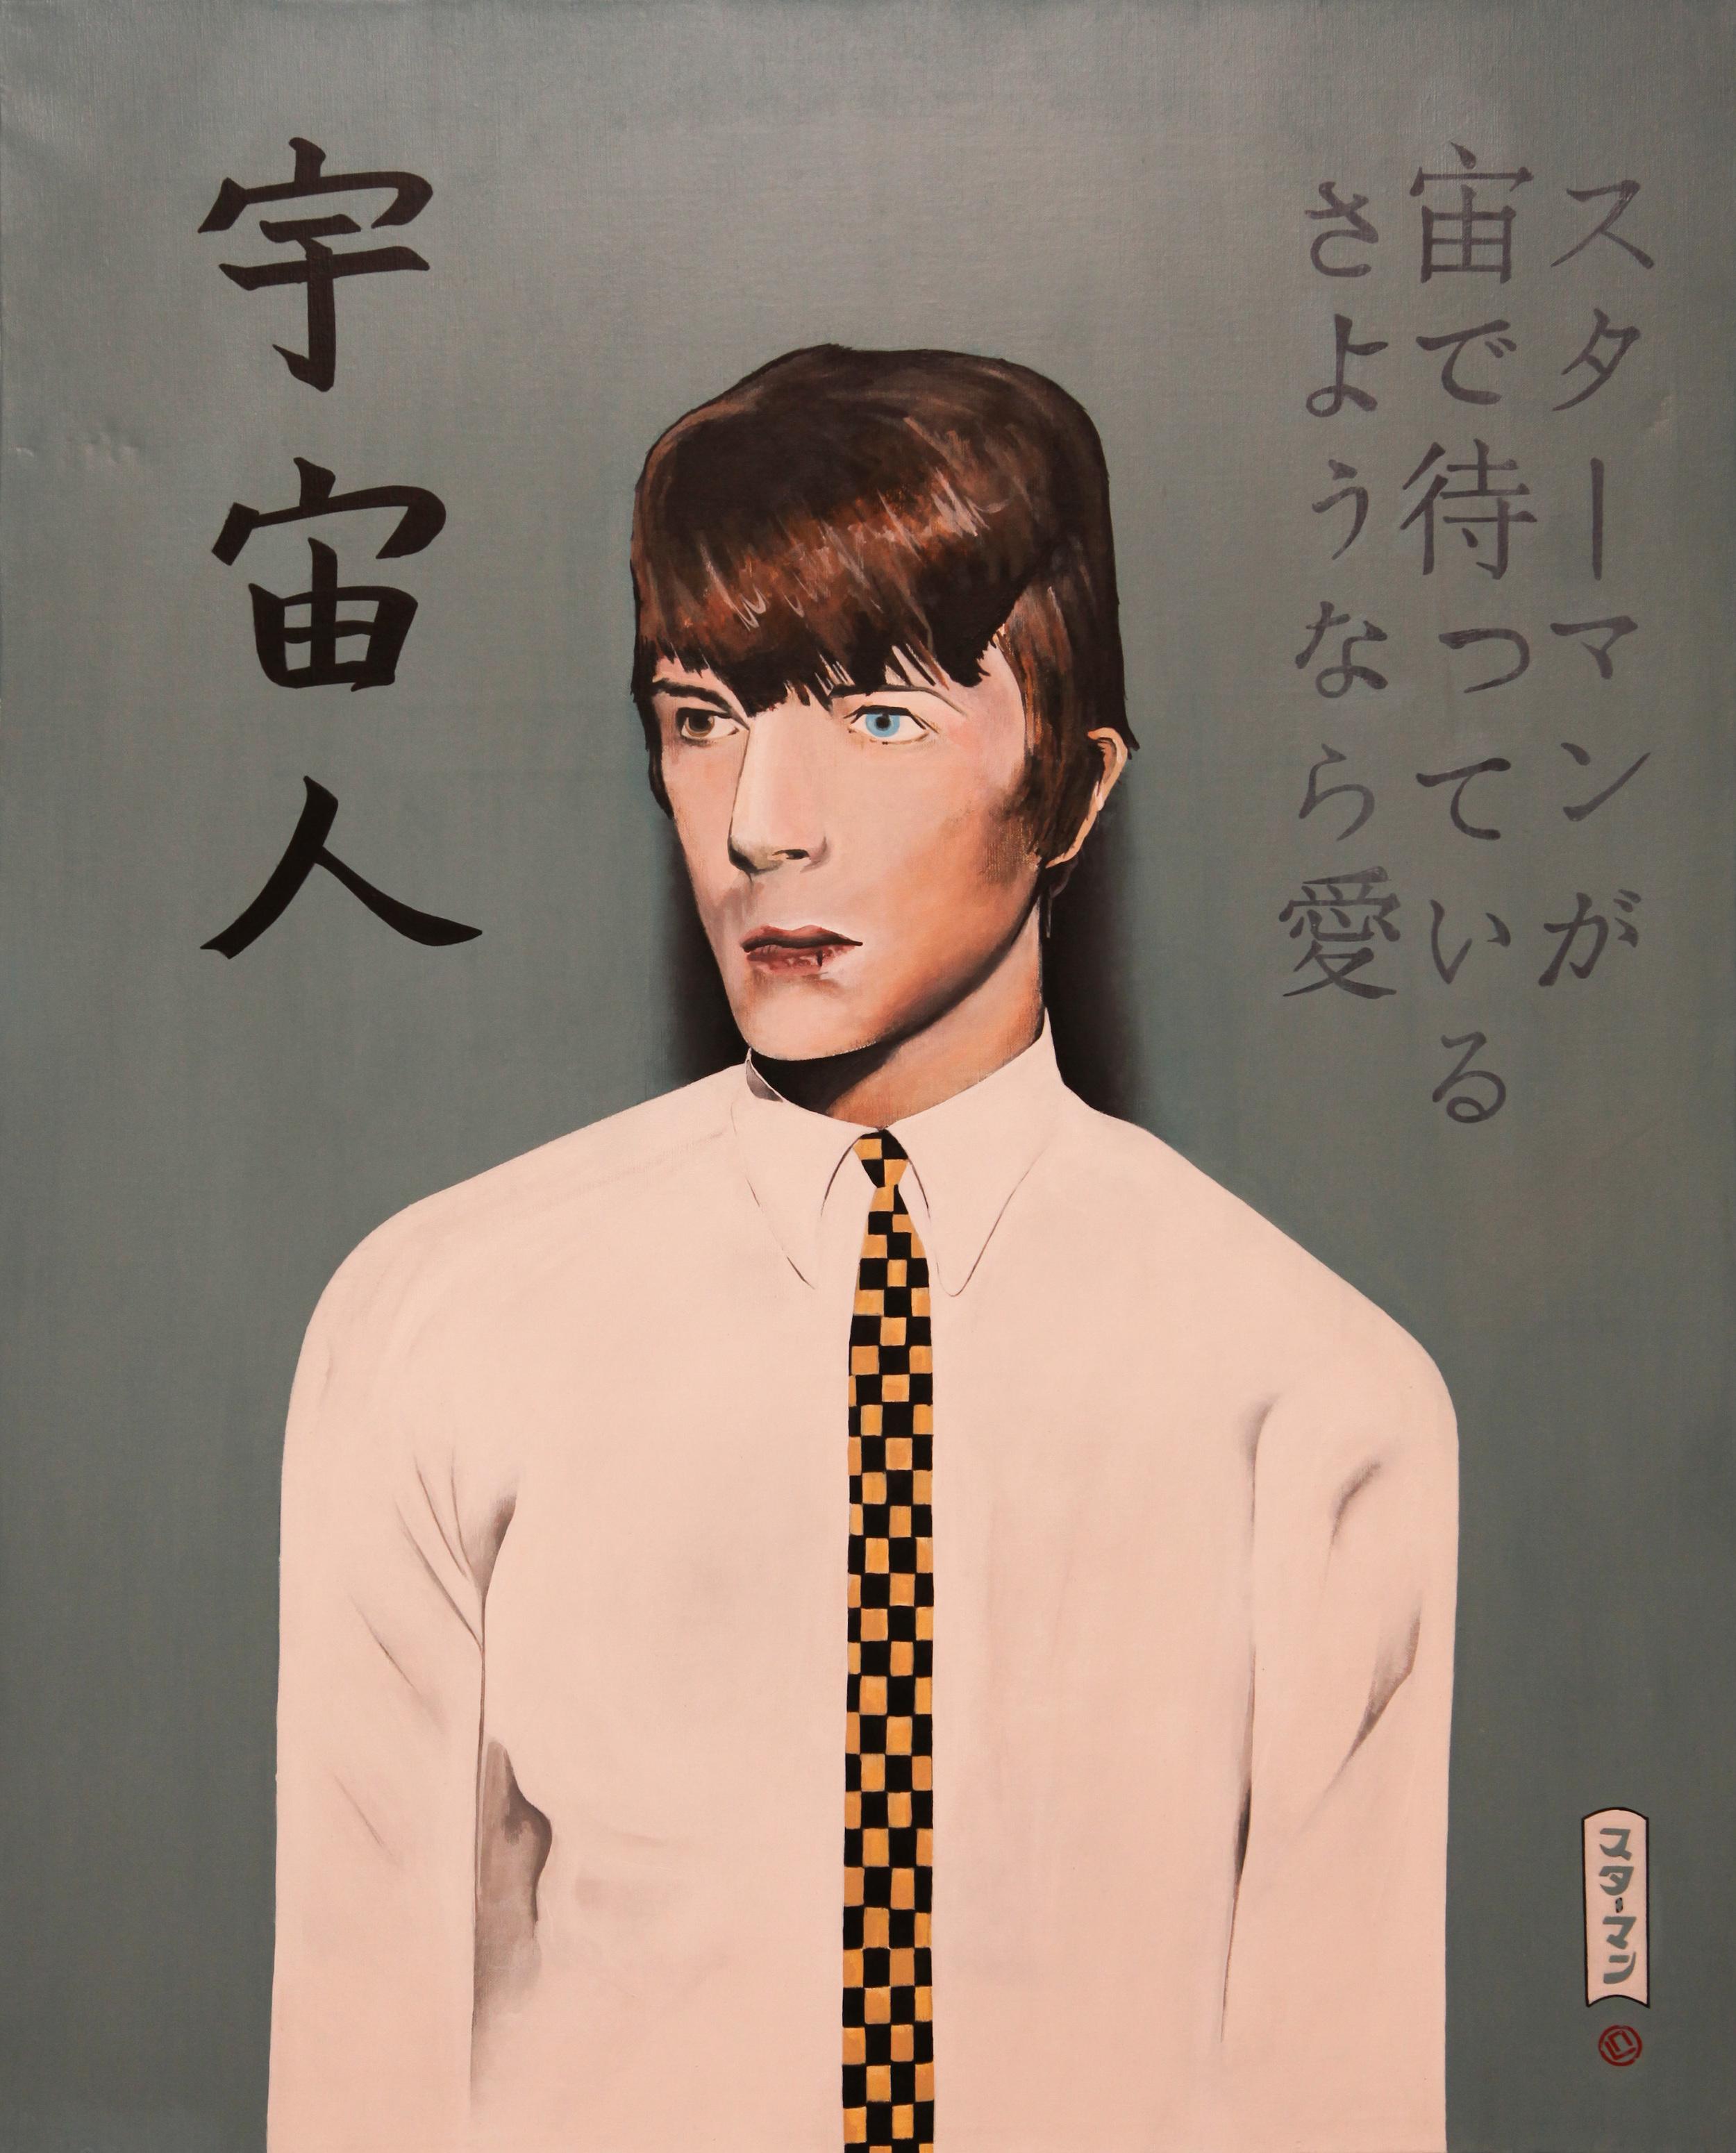 Starman, D. Bowie, (33x40)